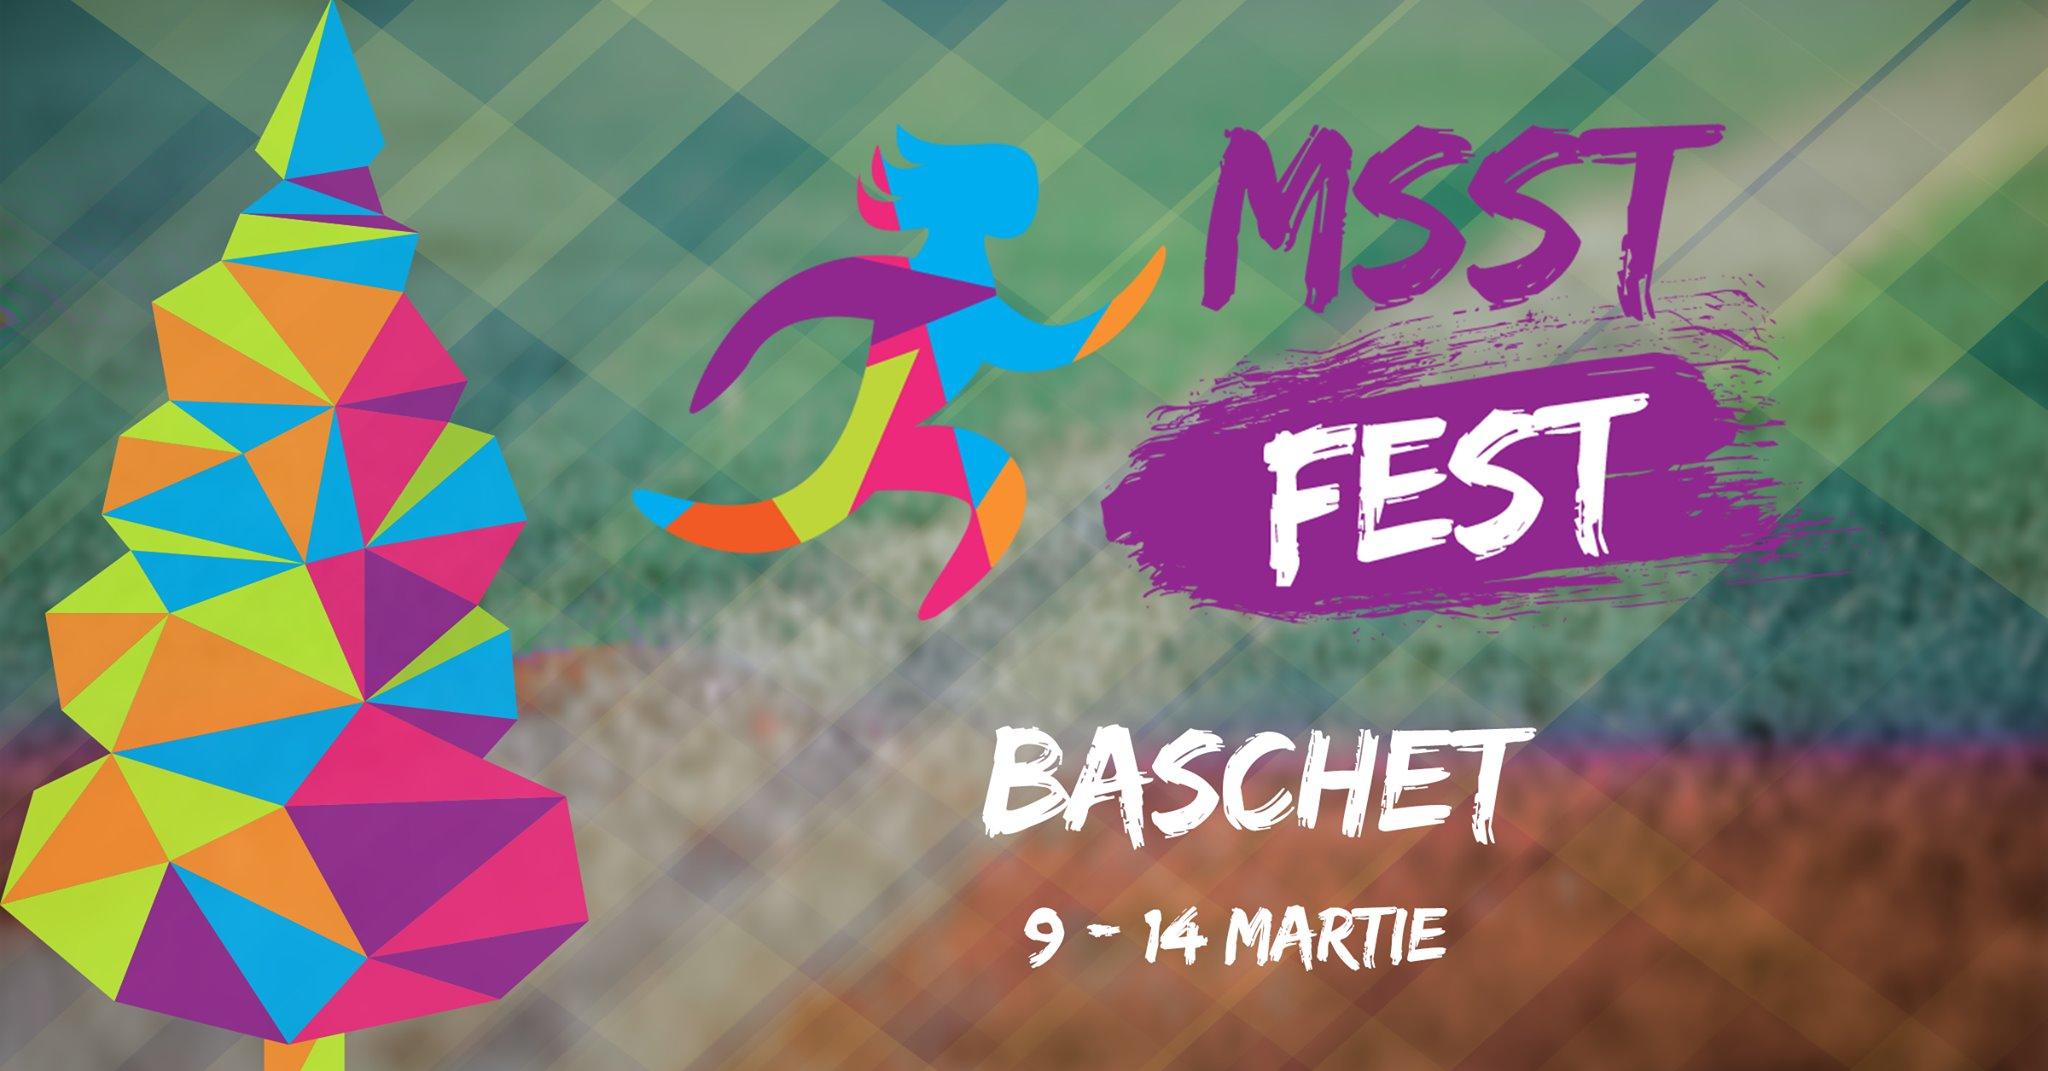 Turneul de Baschet Masculin și Feminin MSST FEST 2020